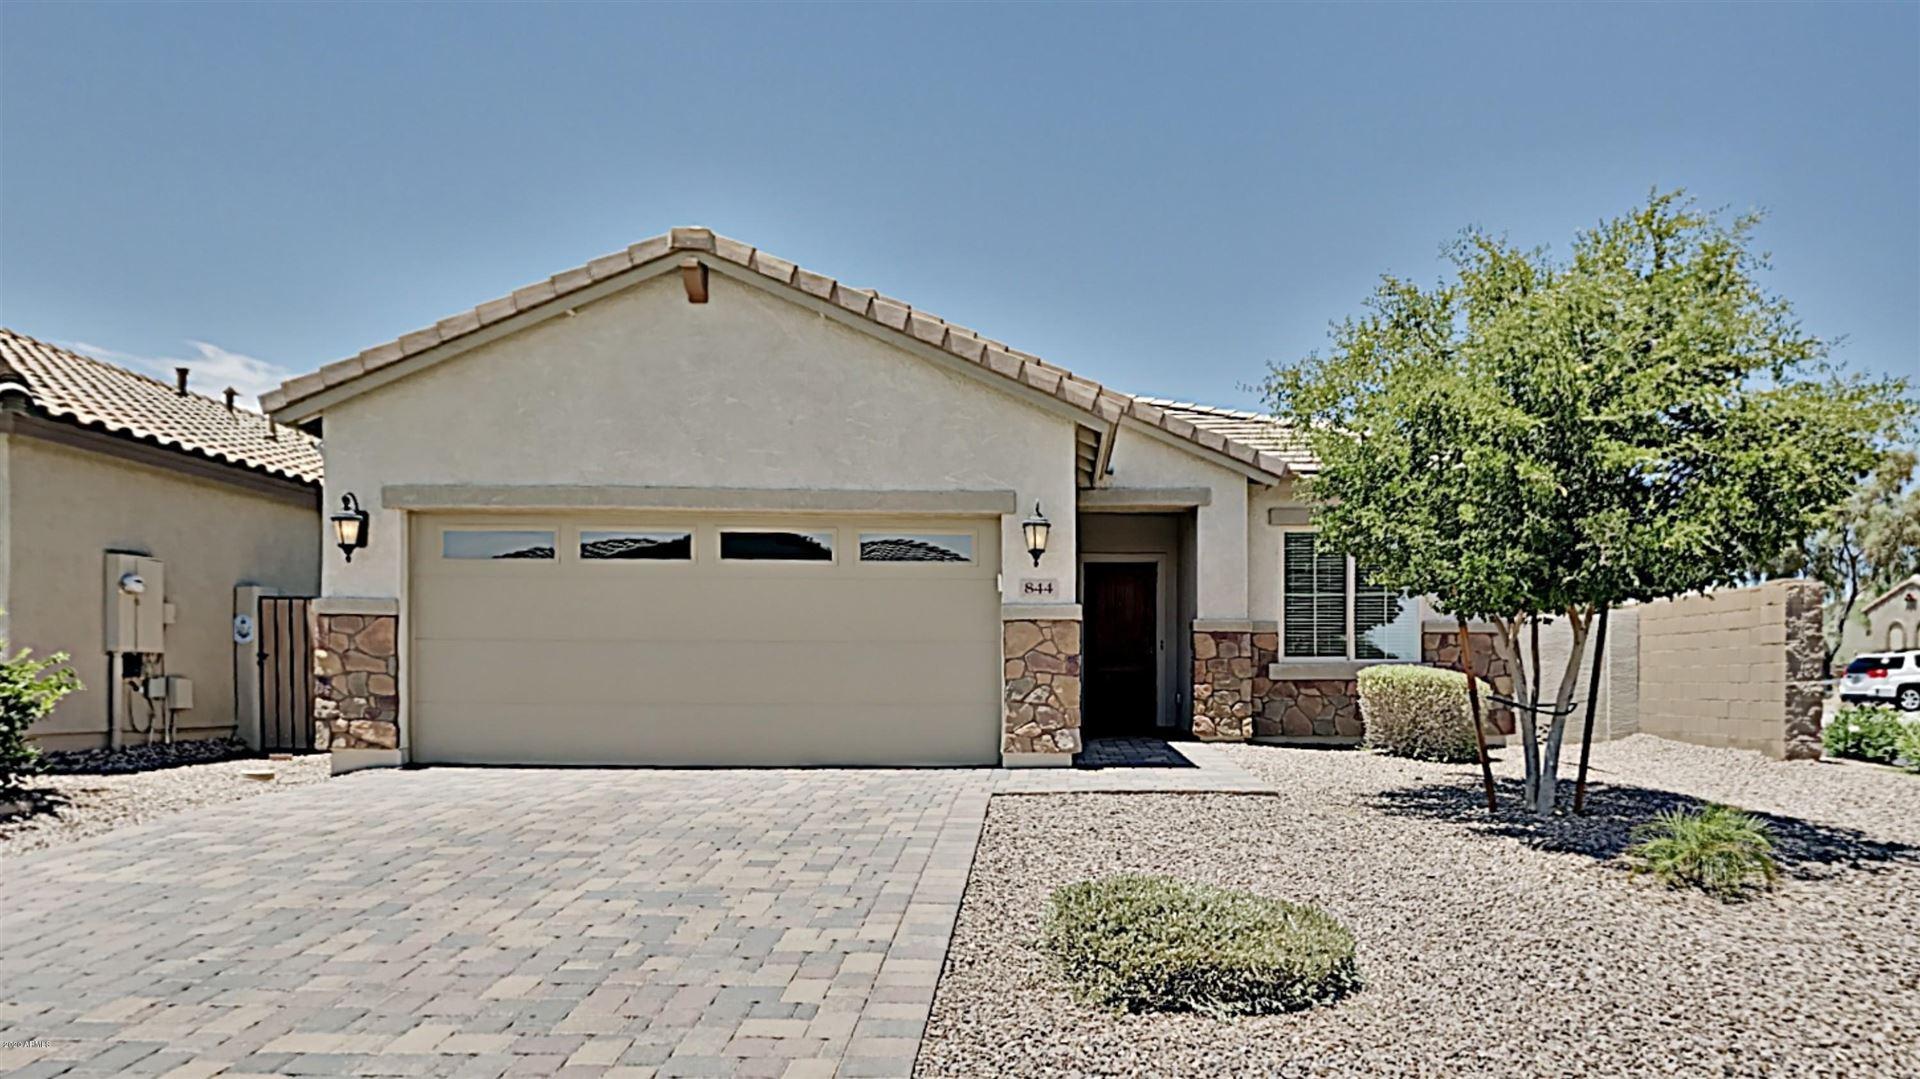 844 E BLOSSOM Road, San Tan Valley, AZ 85143 - #: 6096463